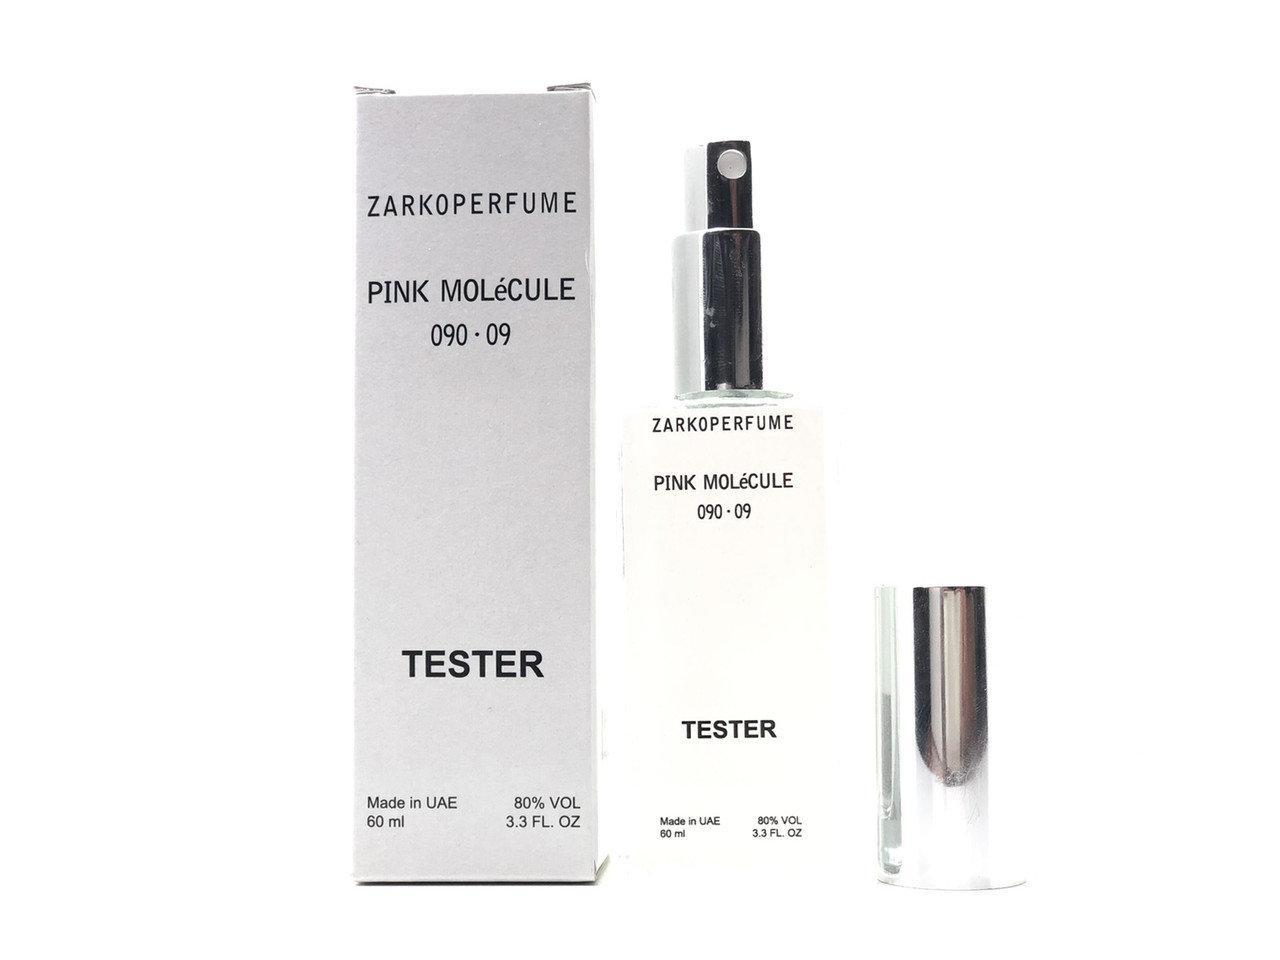 Тестер Zarkoperfume Pink MOL`eCULE 090.09 (зарко парфюм пинк молекула) 60 мл ОАЭ (реплика)